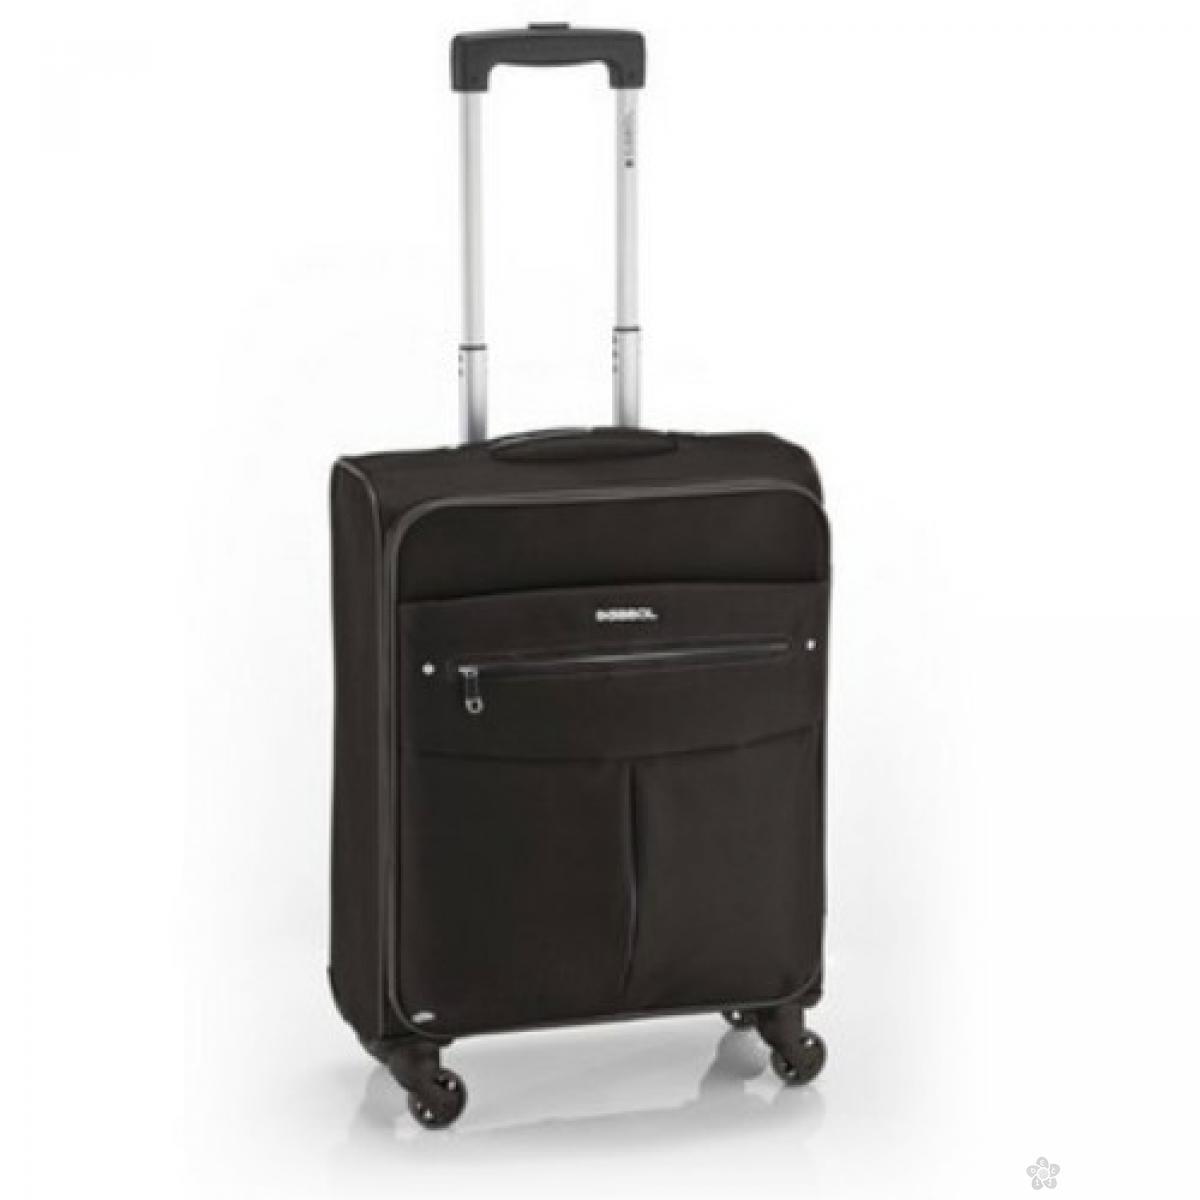 Kofer mali (kabinski) polyester Daisy siva, 16KG112122C